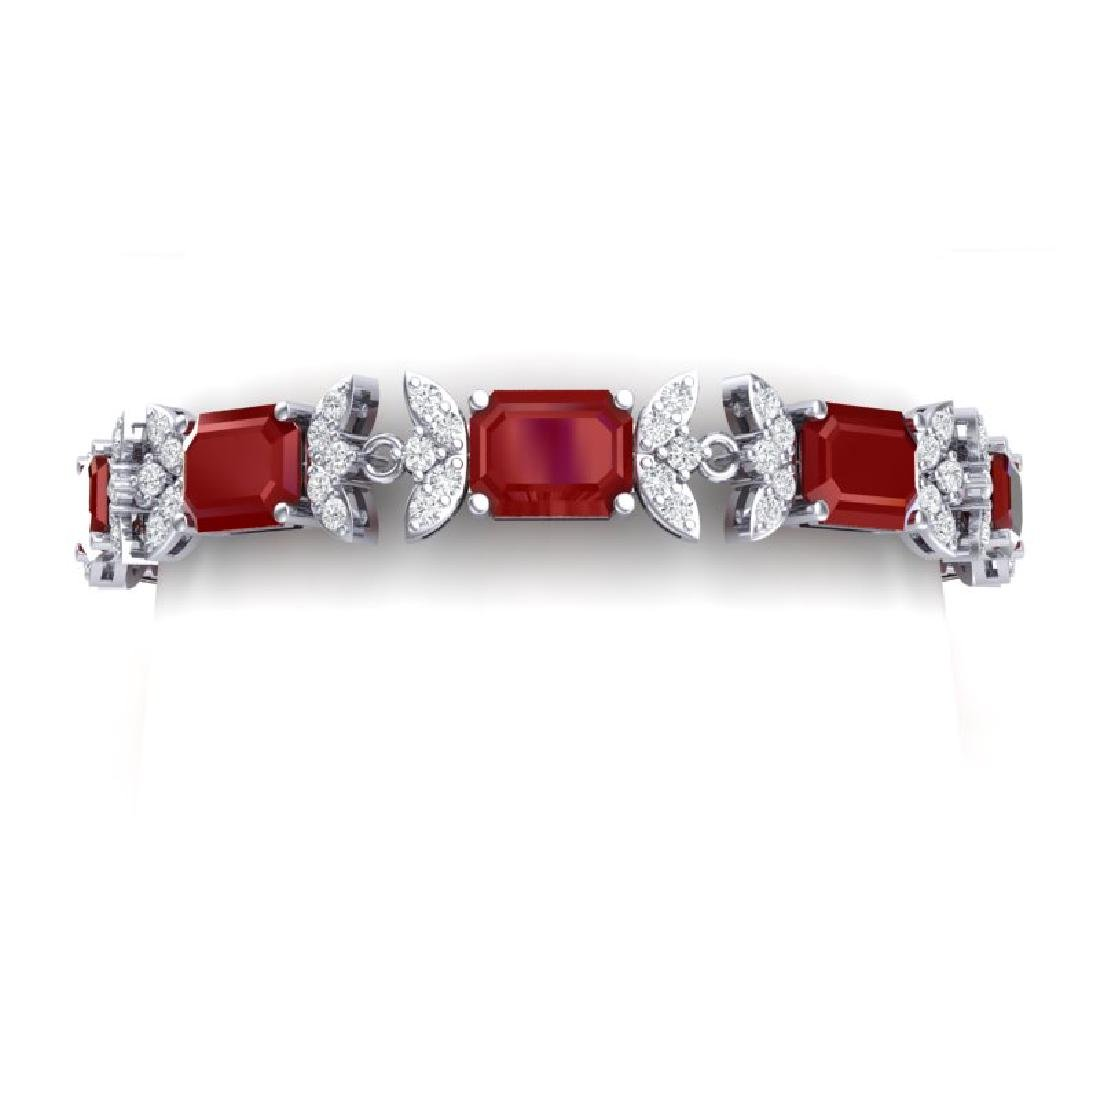 38.13 CTW Royalty Ruby & VS Diamond Bracelet 18K White